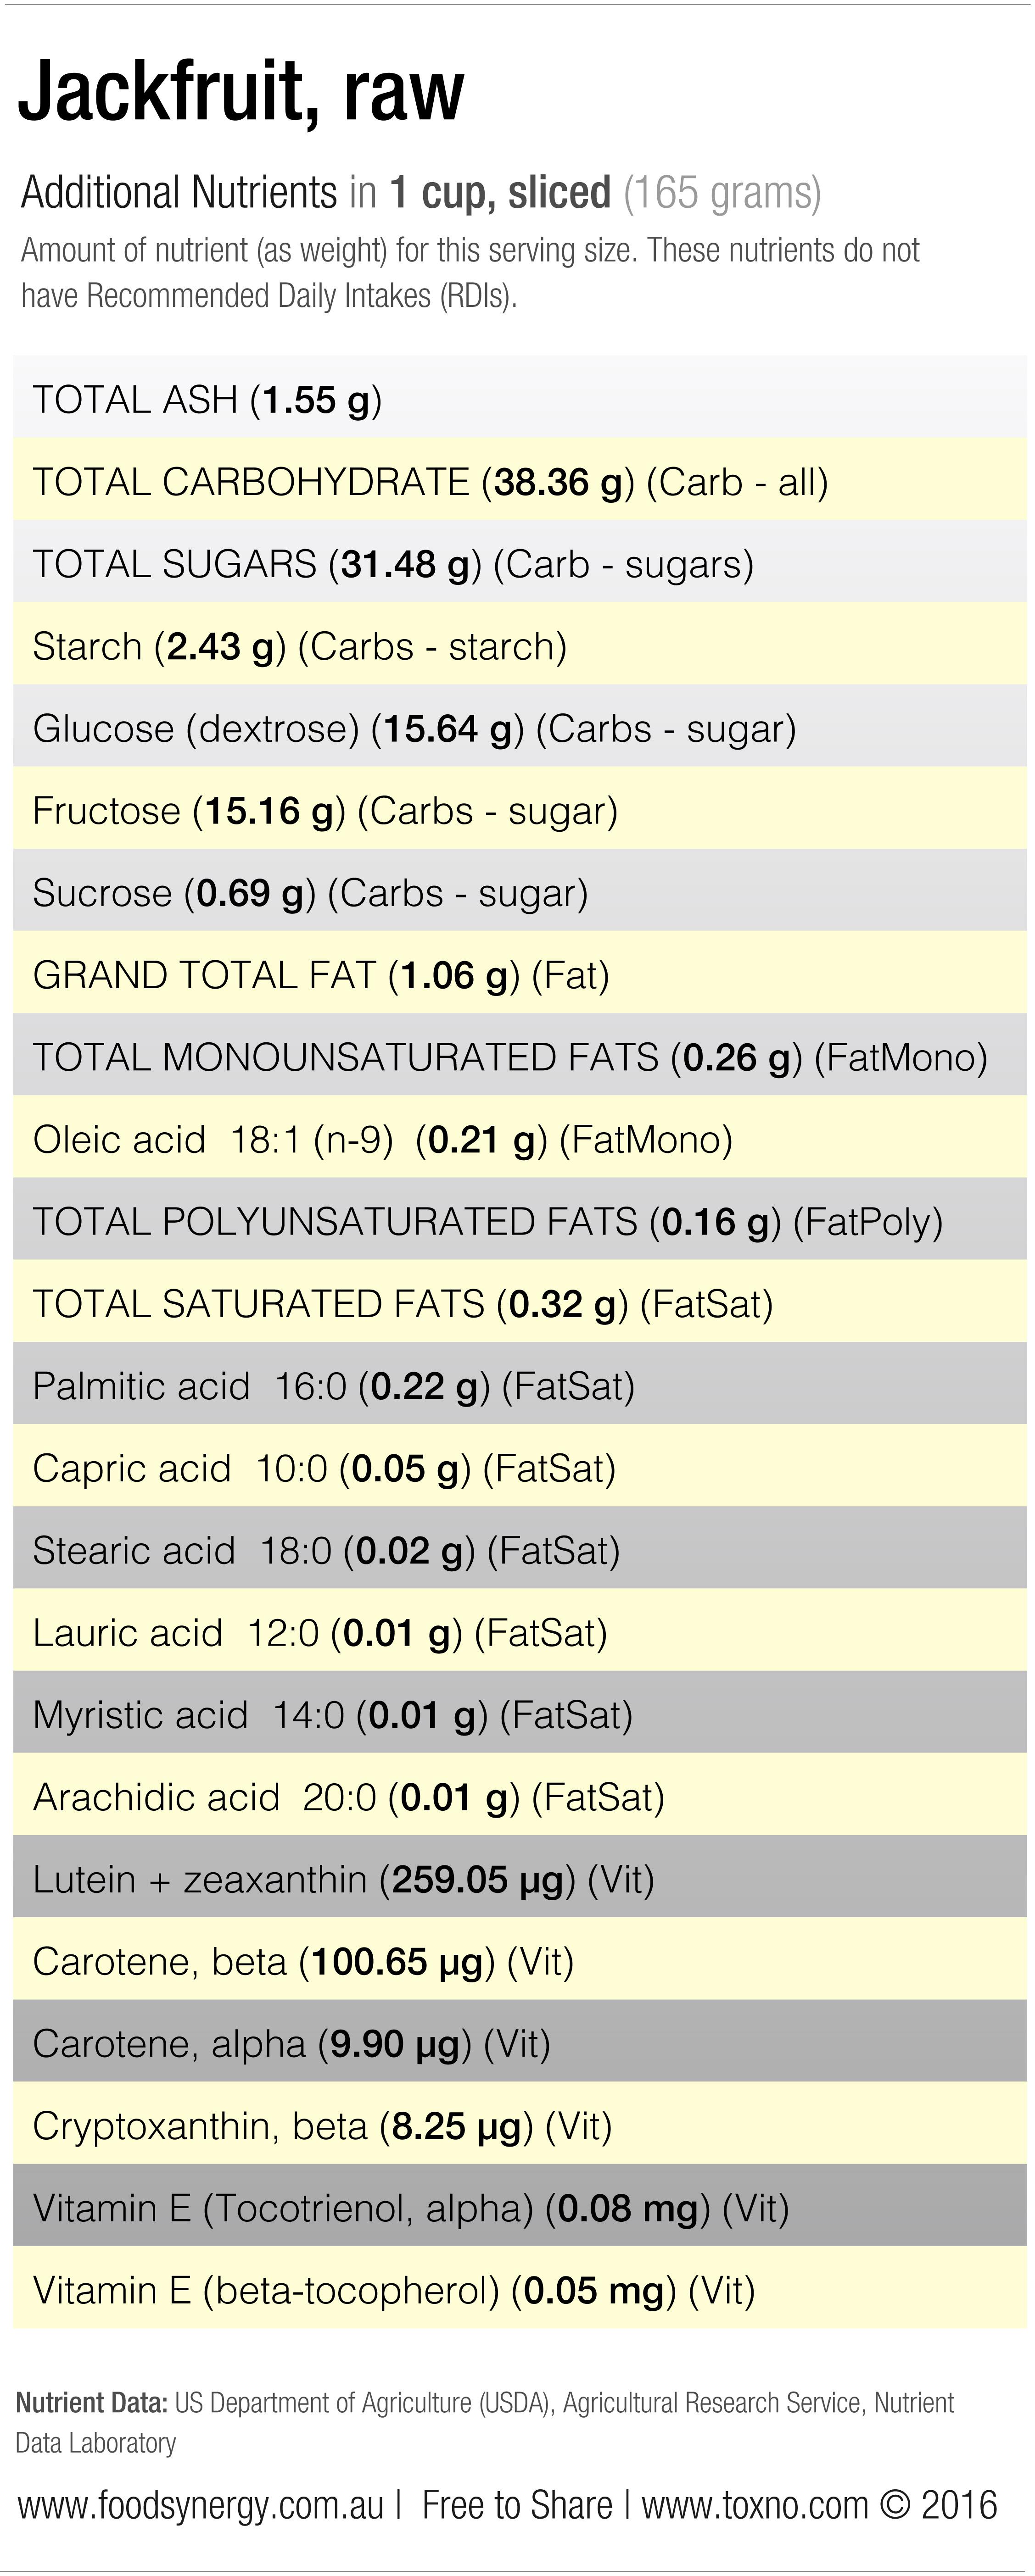 Jackfruit Nutrients 2 © Toxno